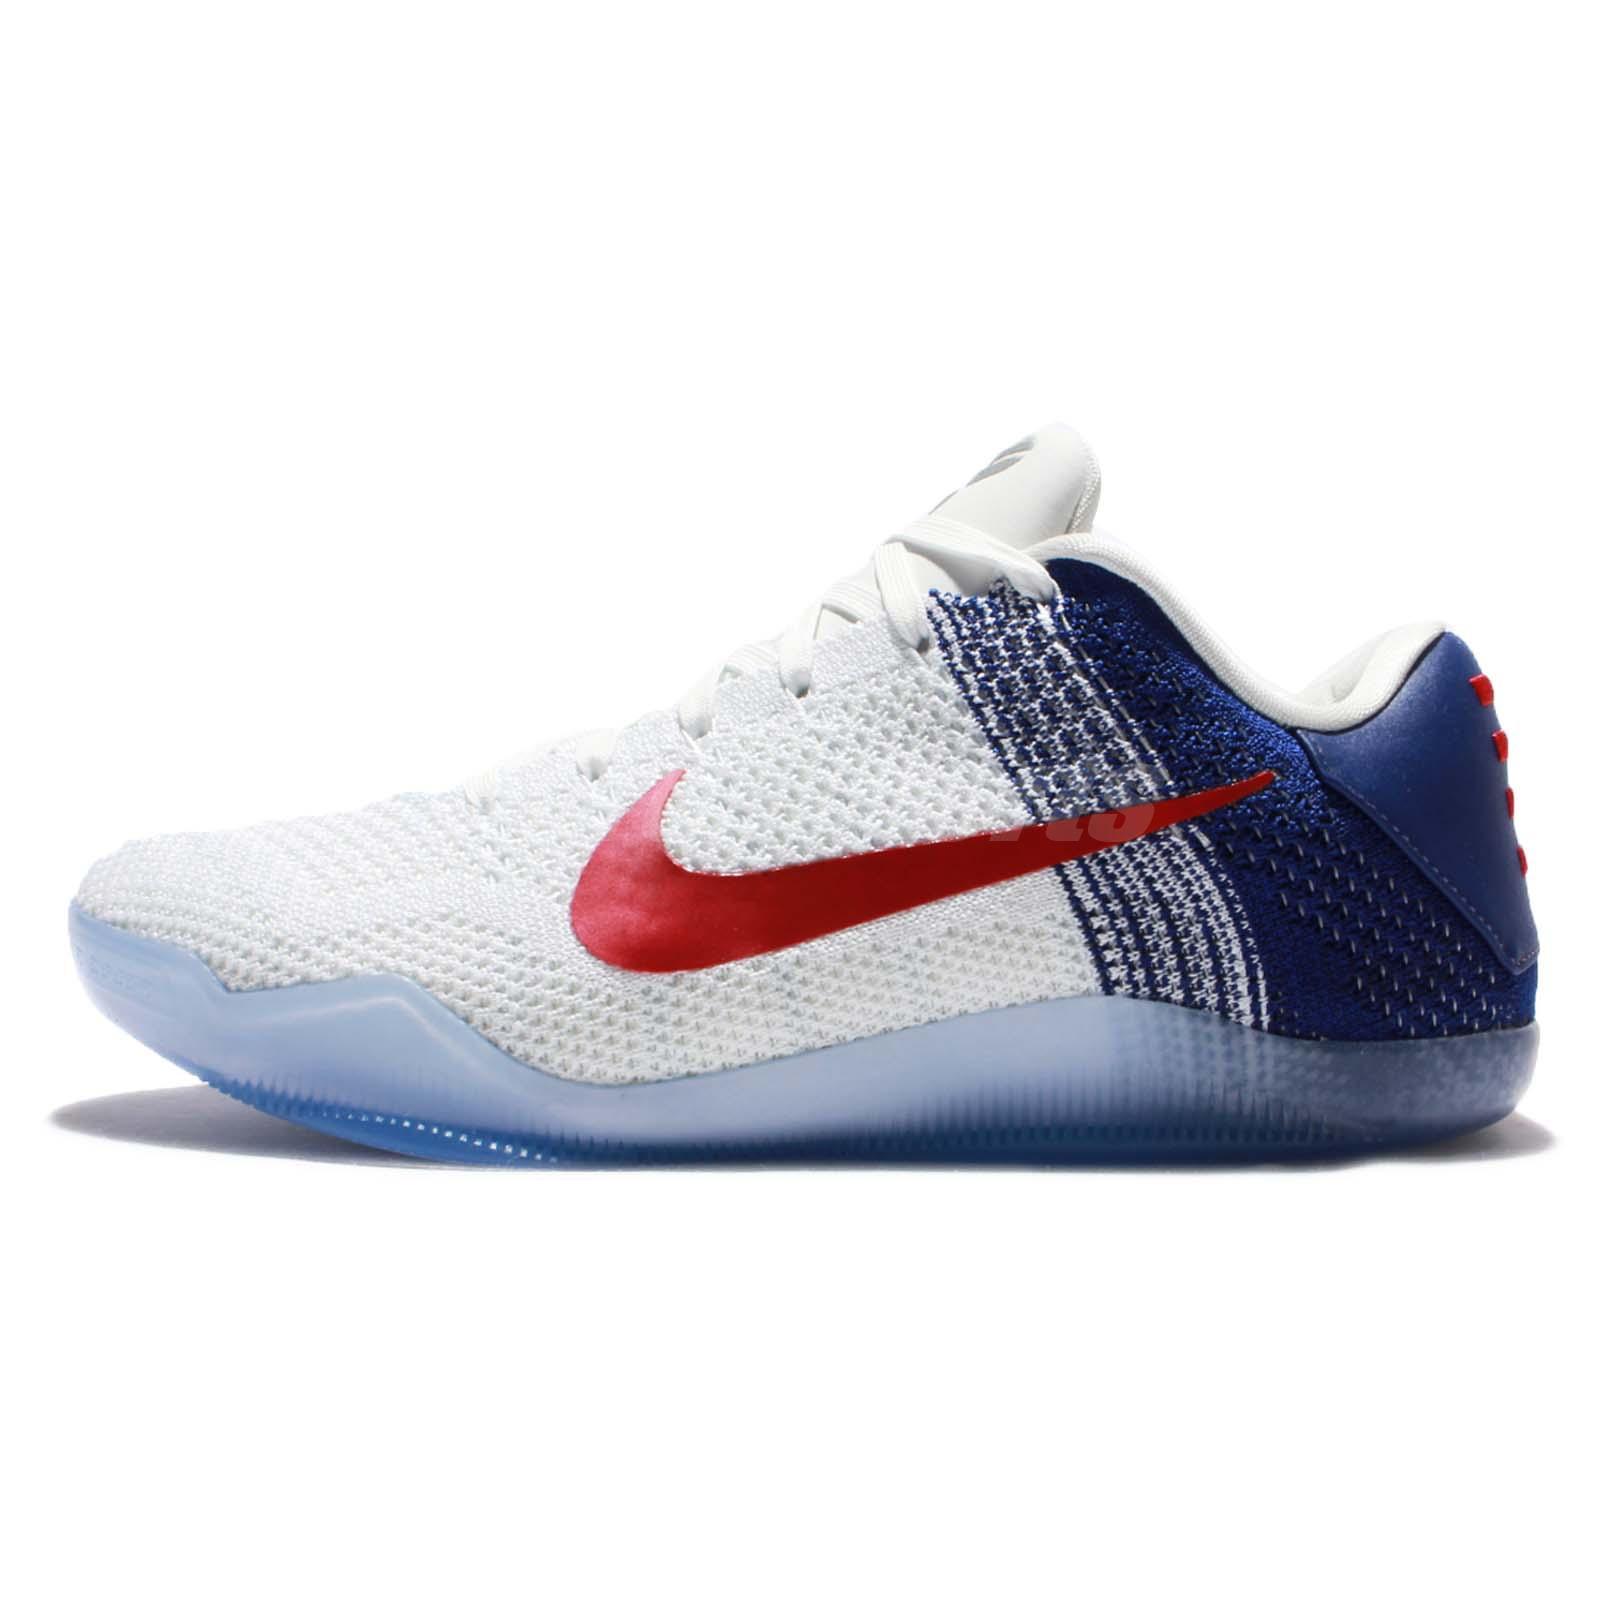 the latest c3dc0 1f04e usa nike kobe 11 flyknit red blue 5e925 5c516  discount nike kobe 11 brazil nike  kobe xi elite low 11 usa rio olympics bryant men